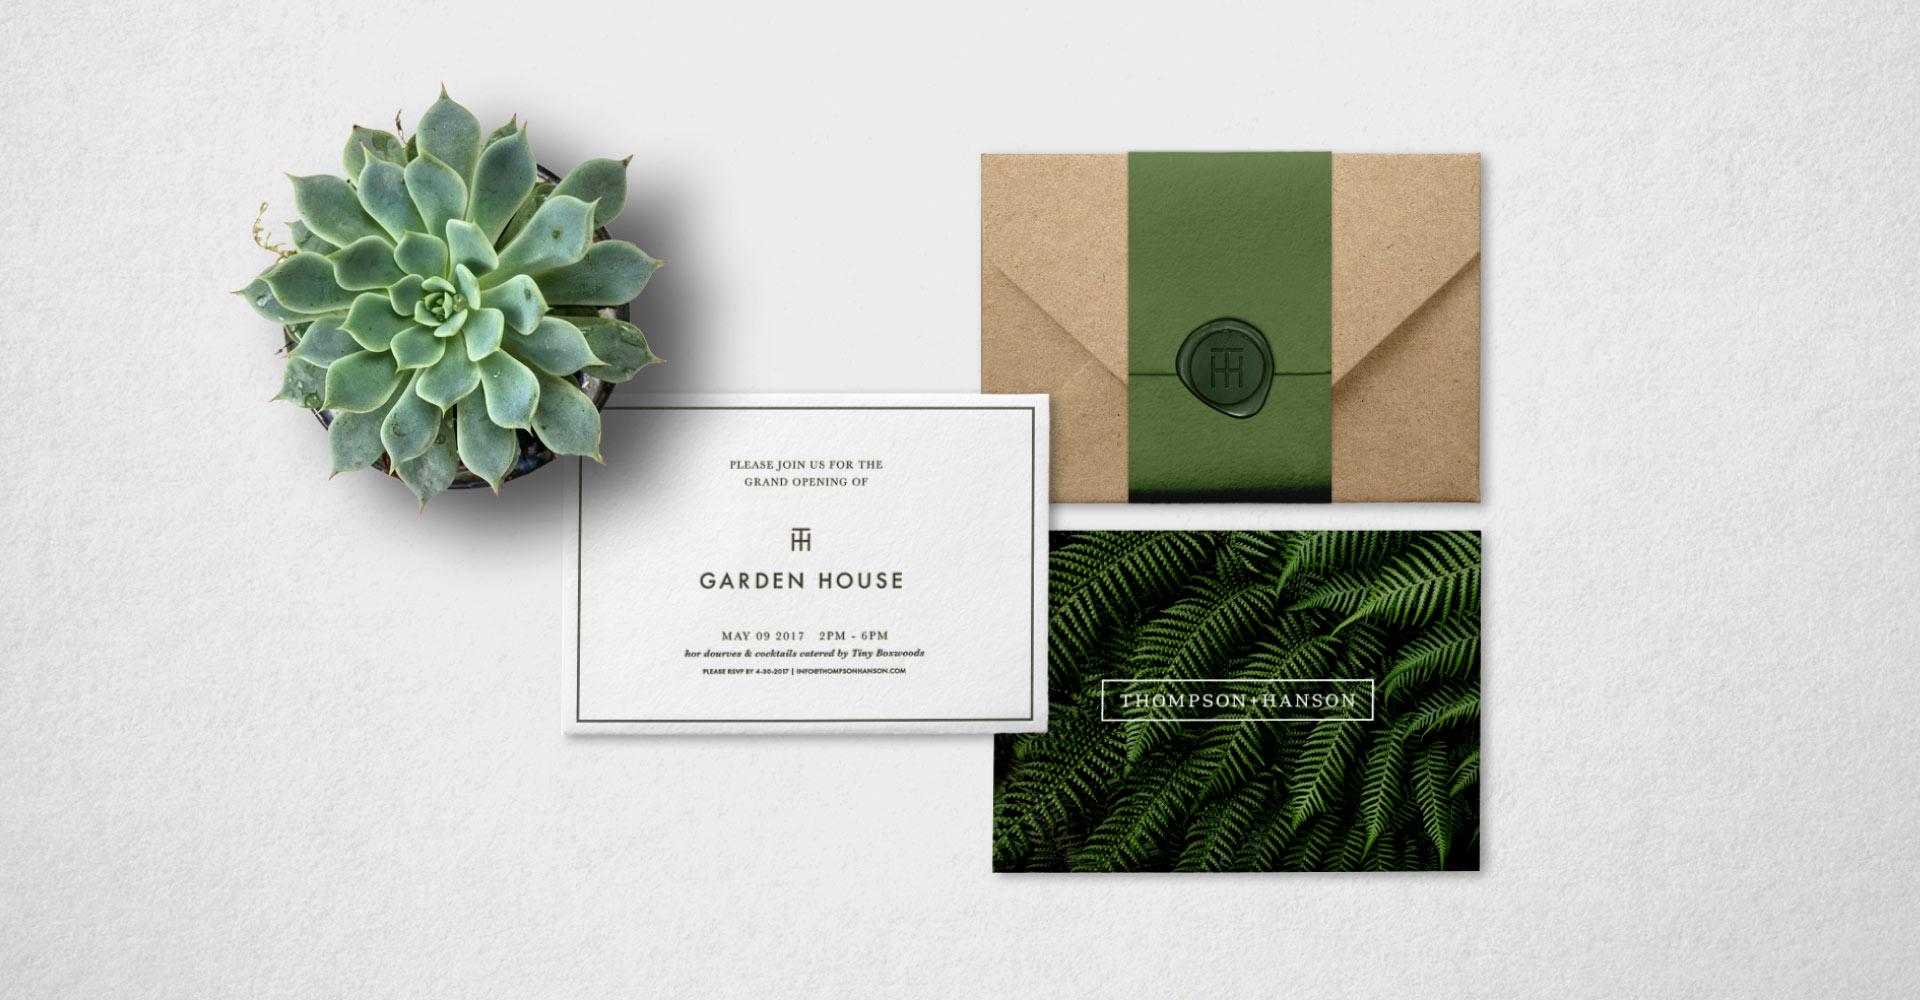 Creative_Retail_Packaging_Thompson_Hanson_Branding_9.jpg